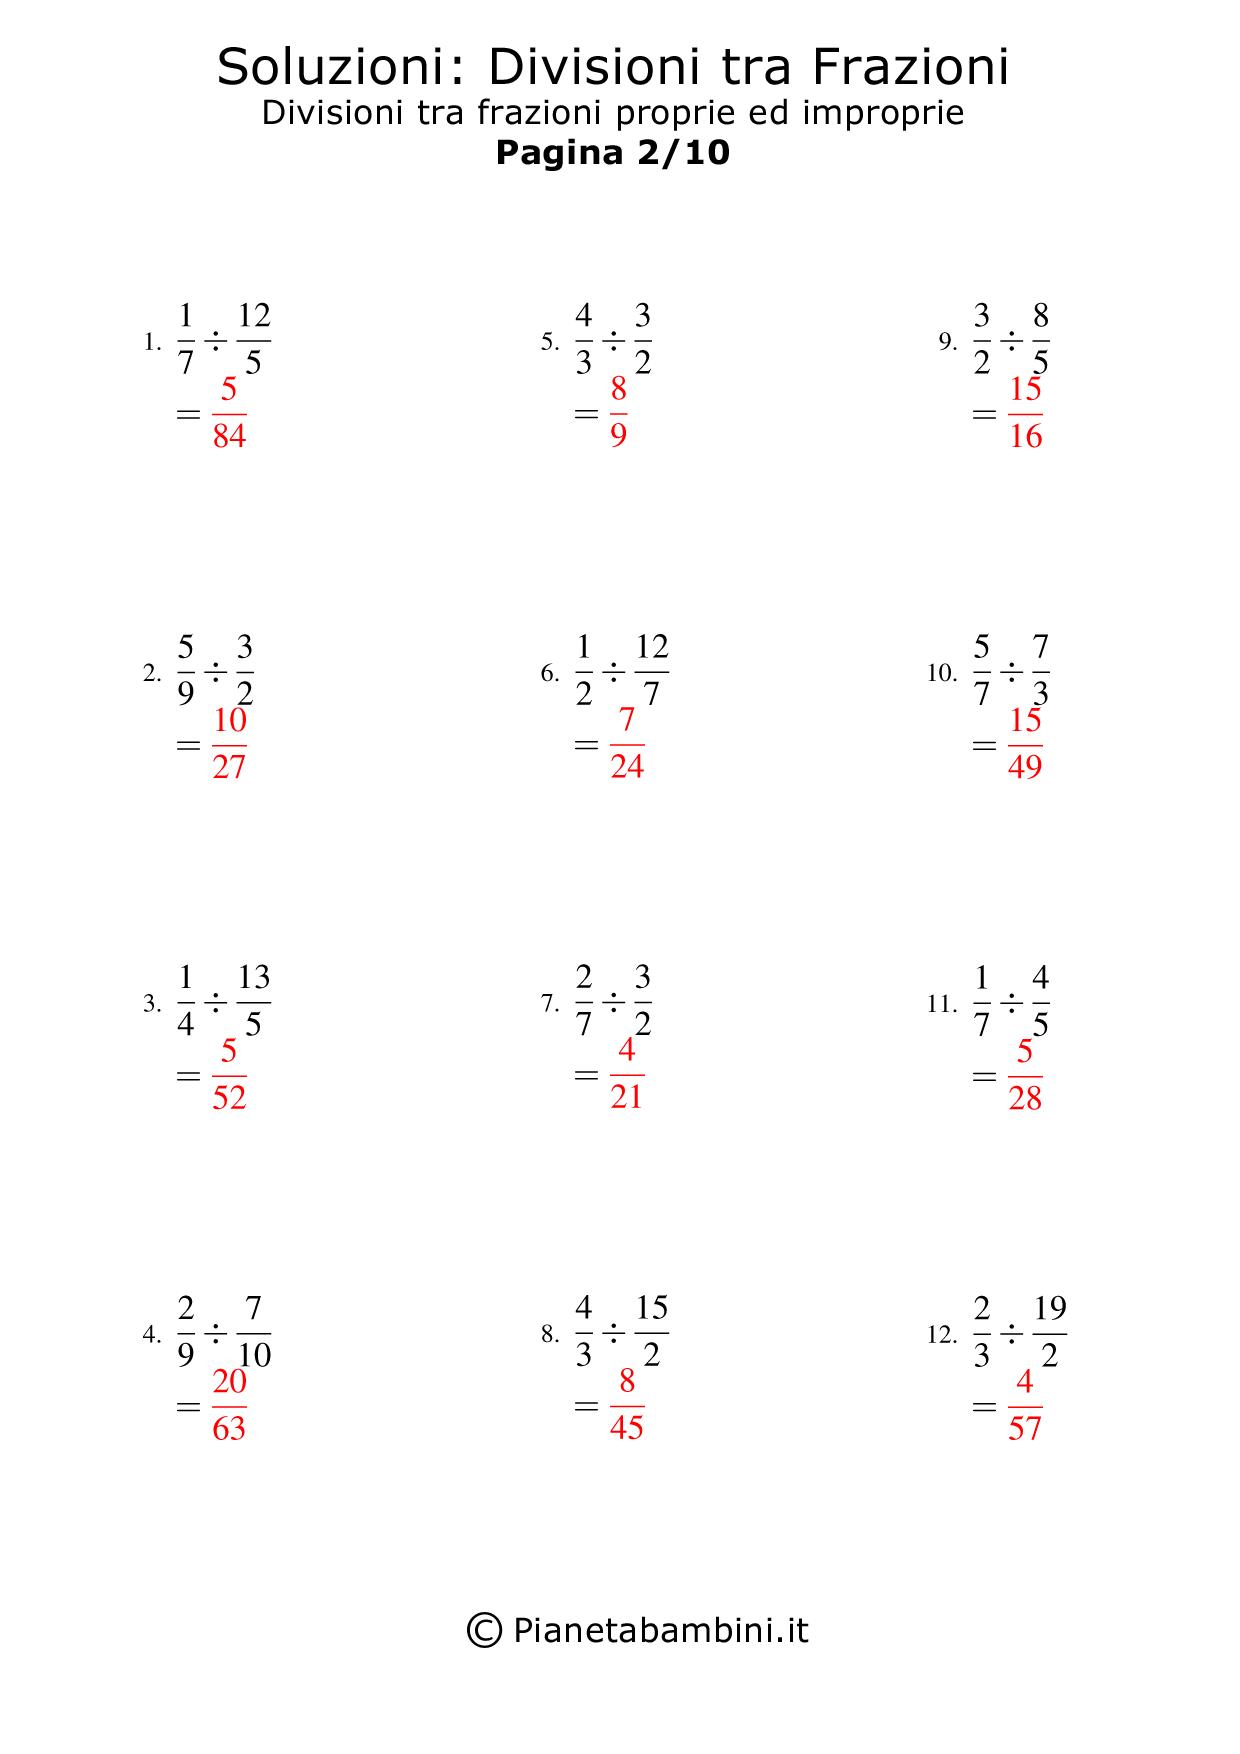 Soluzioni-Divisioni-Frazioni-Proprie-Improprie_02